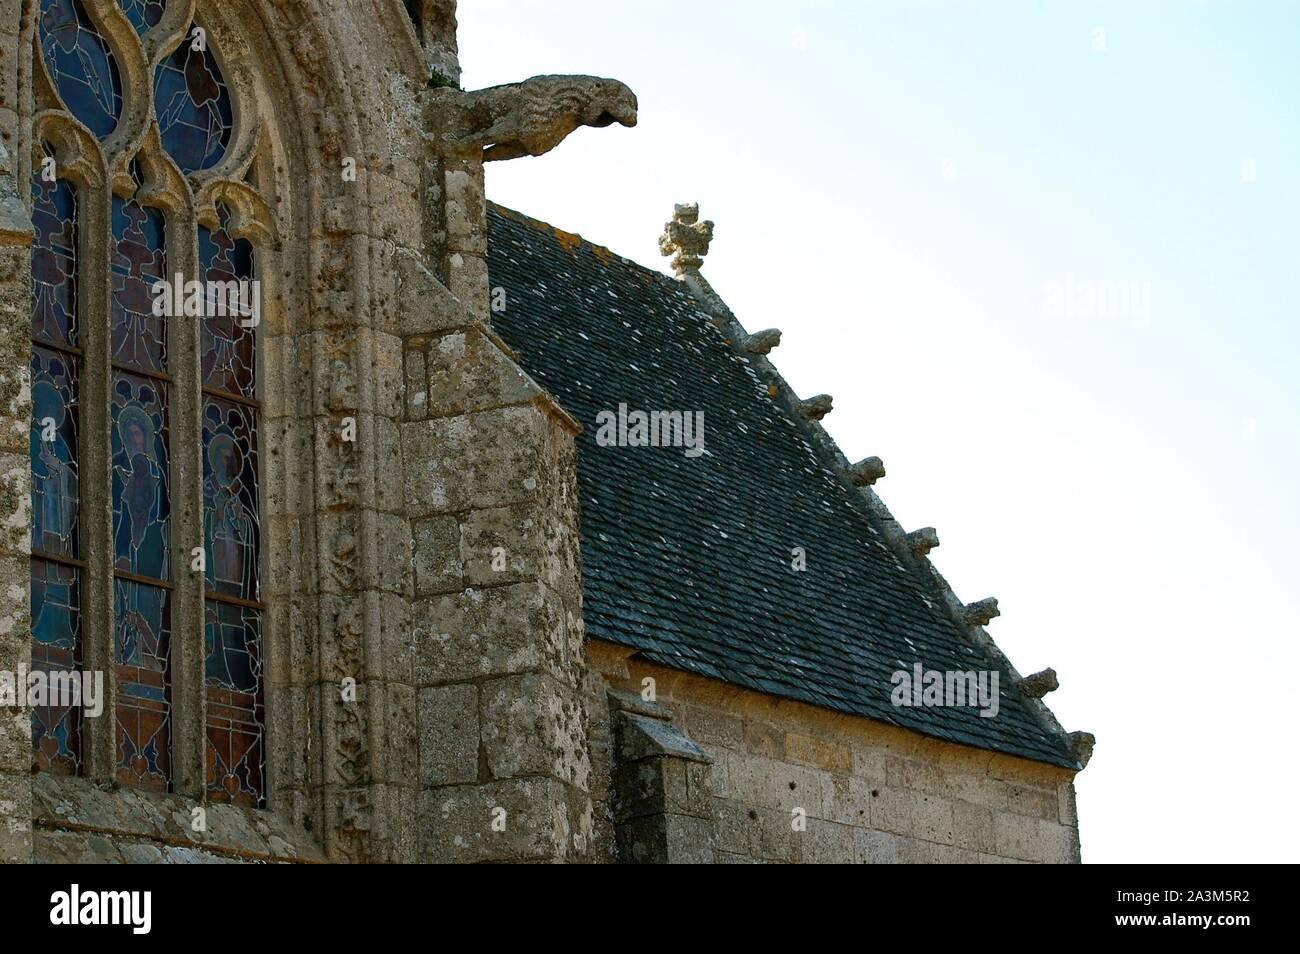 Tredrez, Eglise Notre Dame 220411 Stock Photo